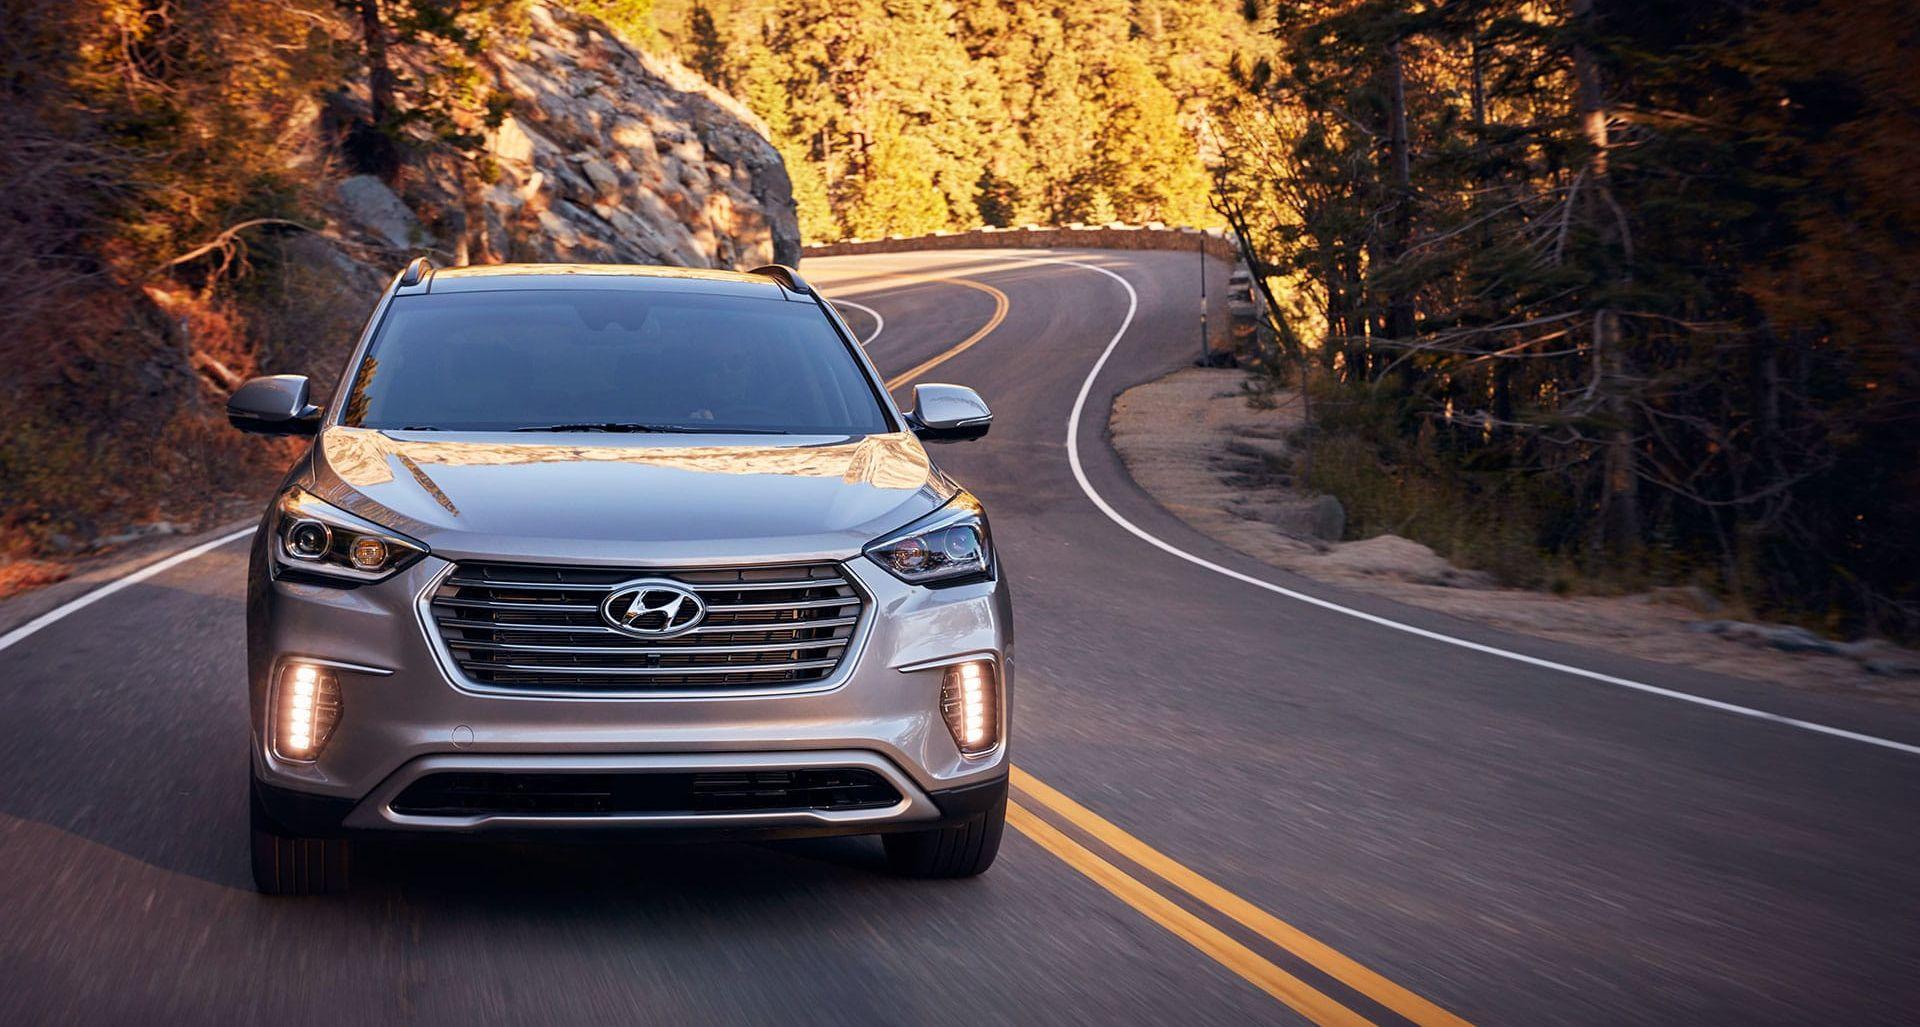 Hyundai Lease Deals >> Great Hyundai Lease Deals Near Washington Dc Pohanka